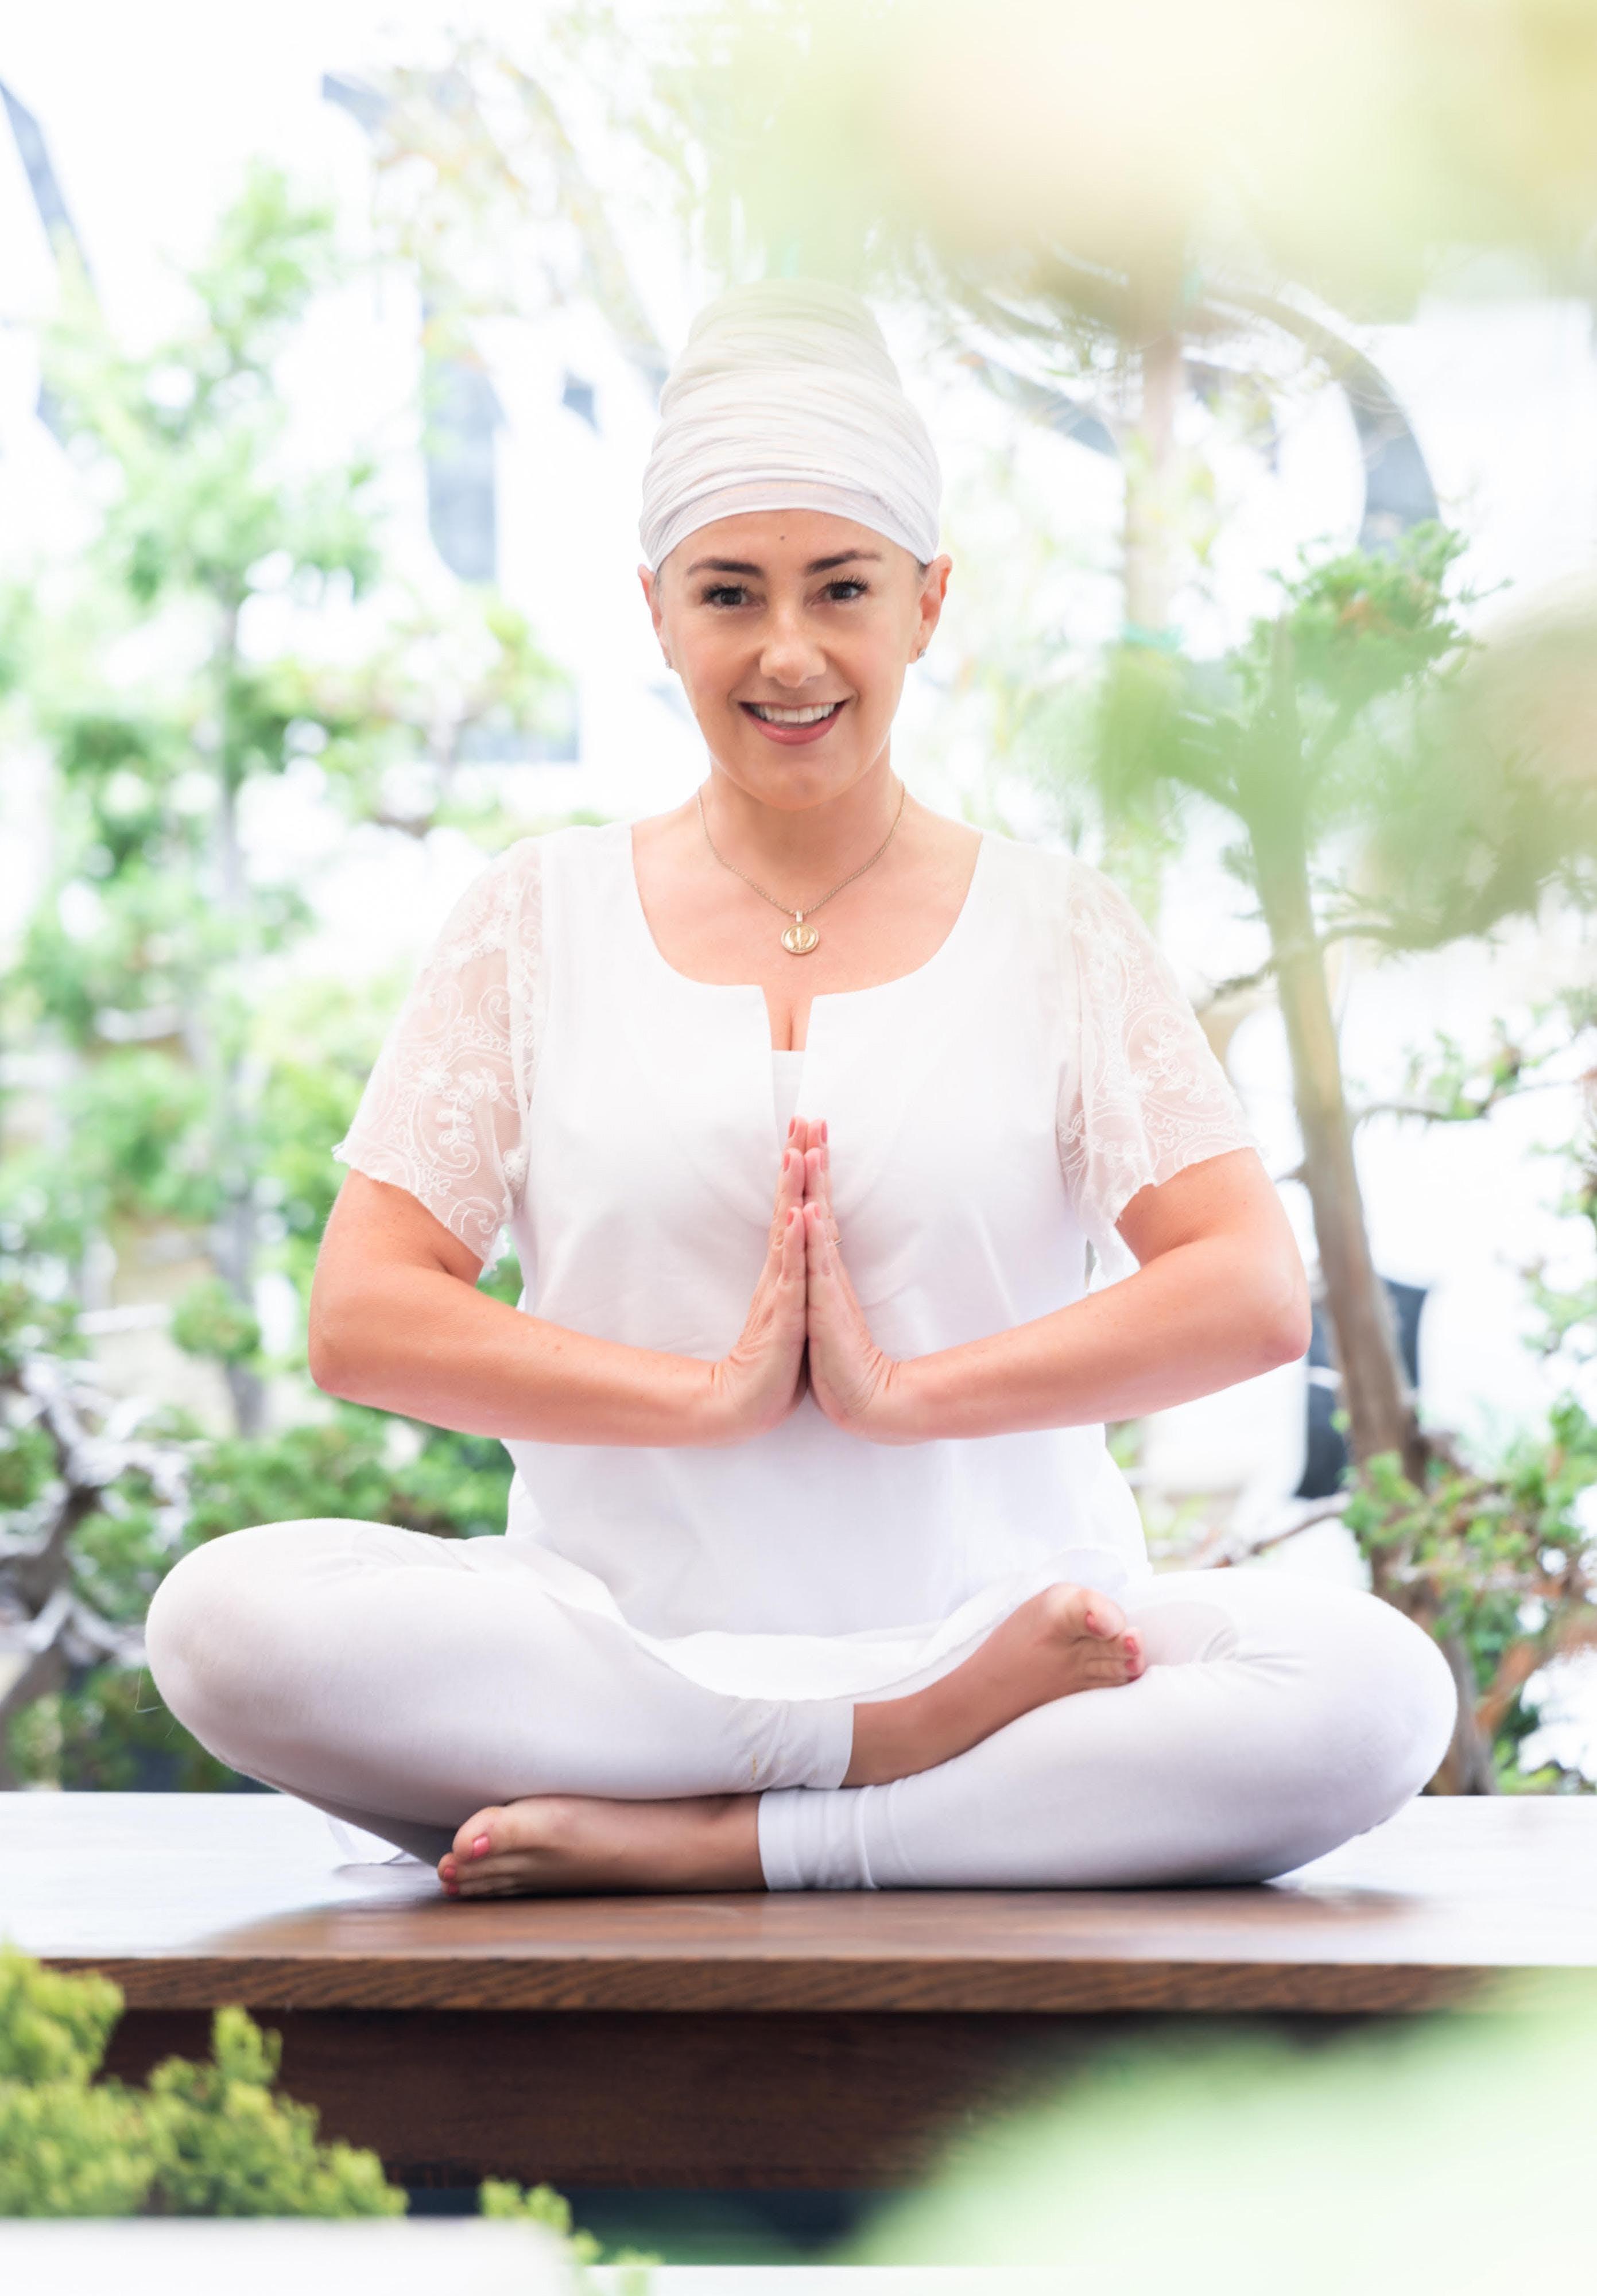 Kundalini Yoga And Meditation With Devi Dyal 15 Jun 2019